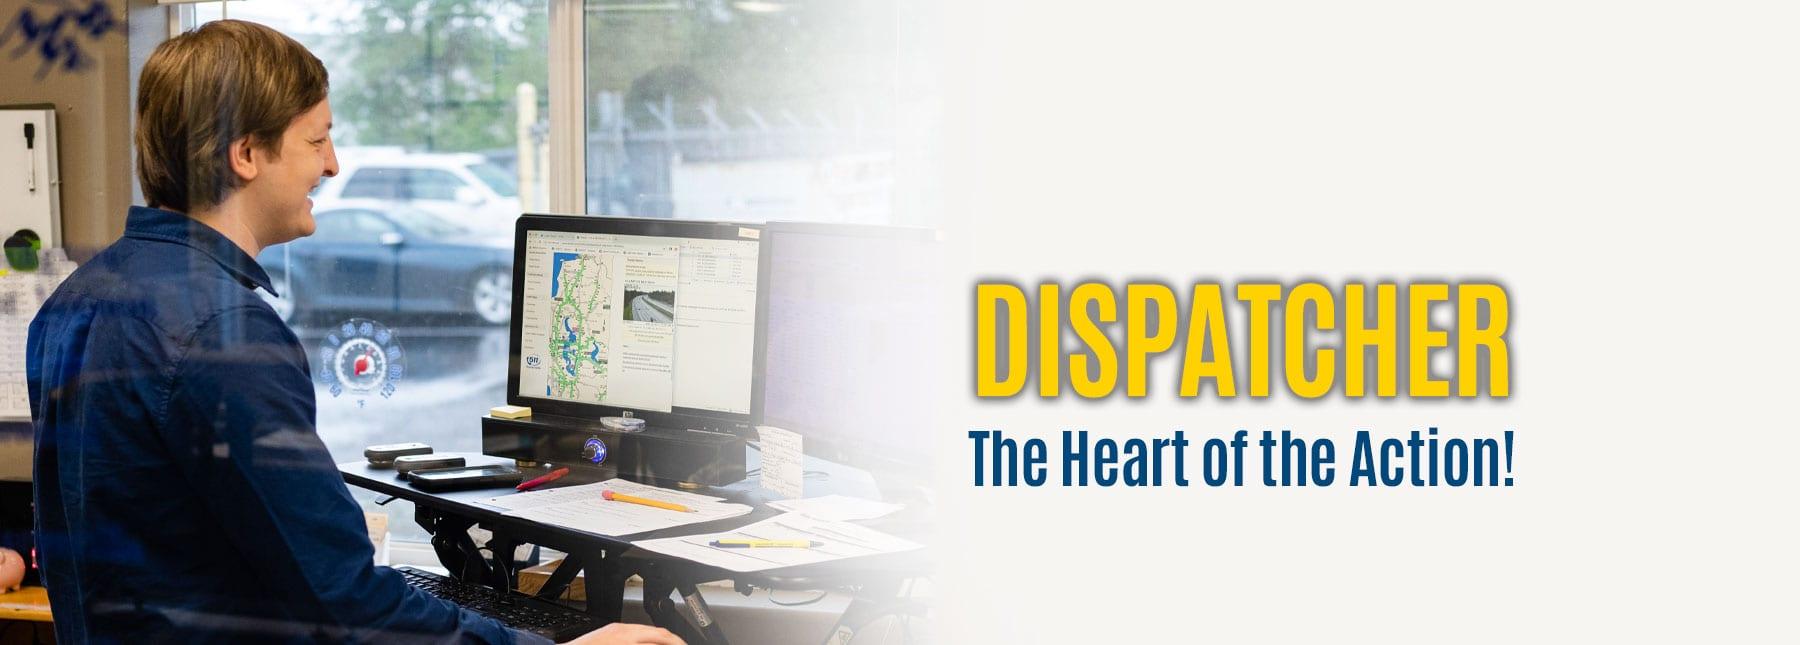 Dispatcher 20210706 1800x645